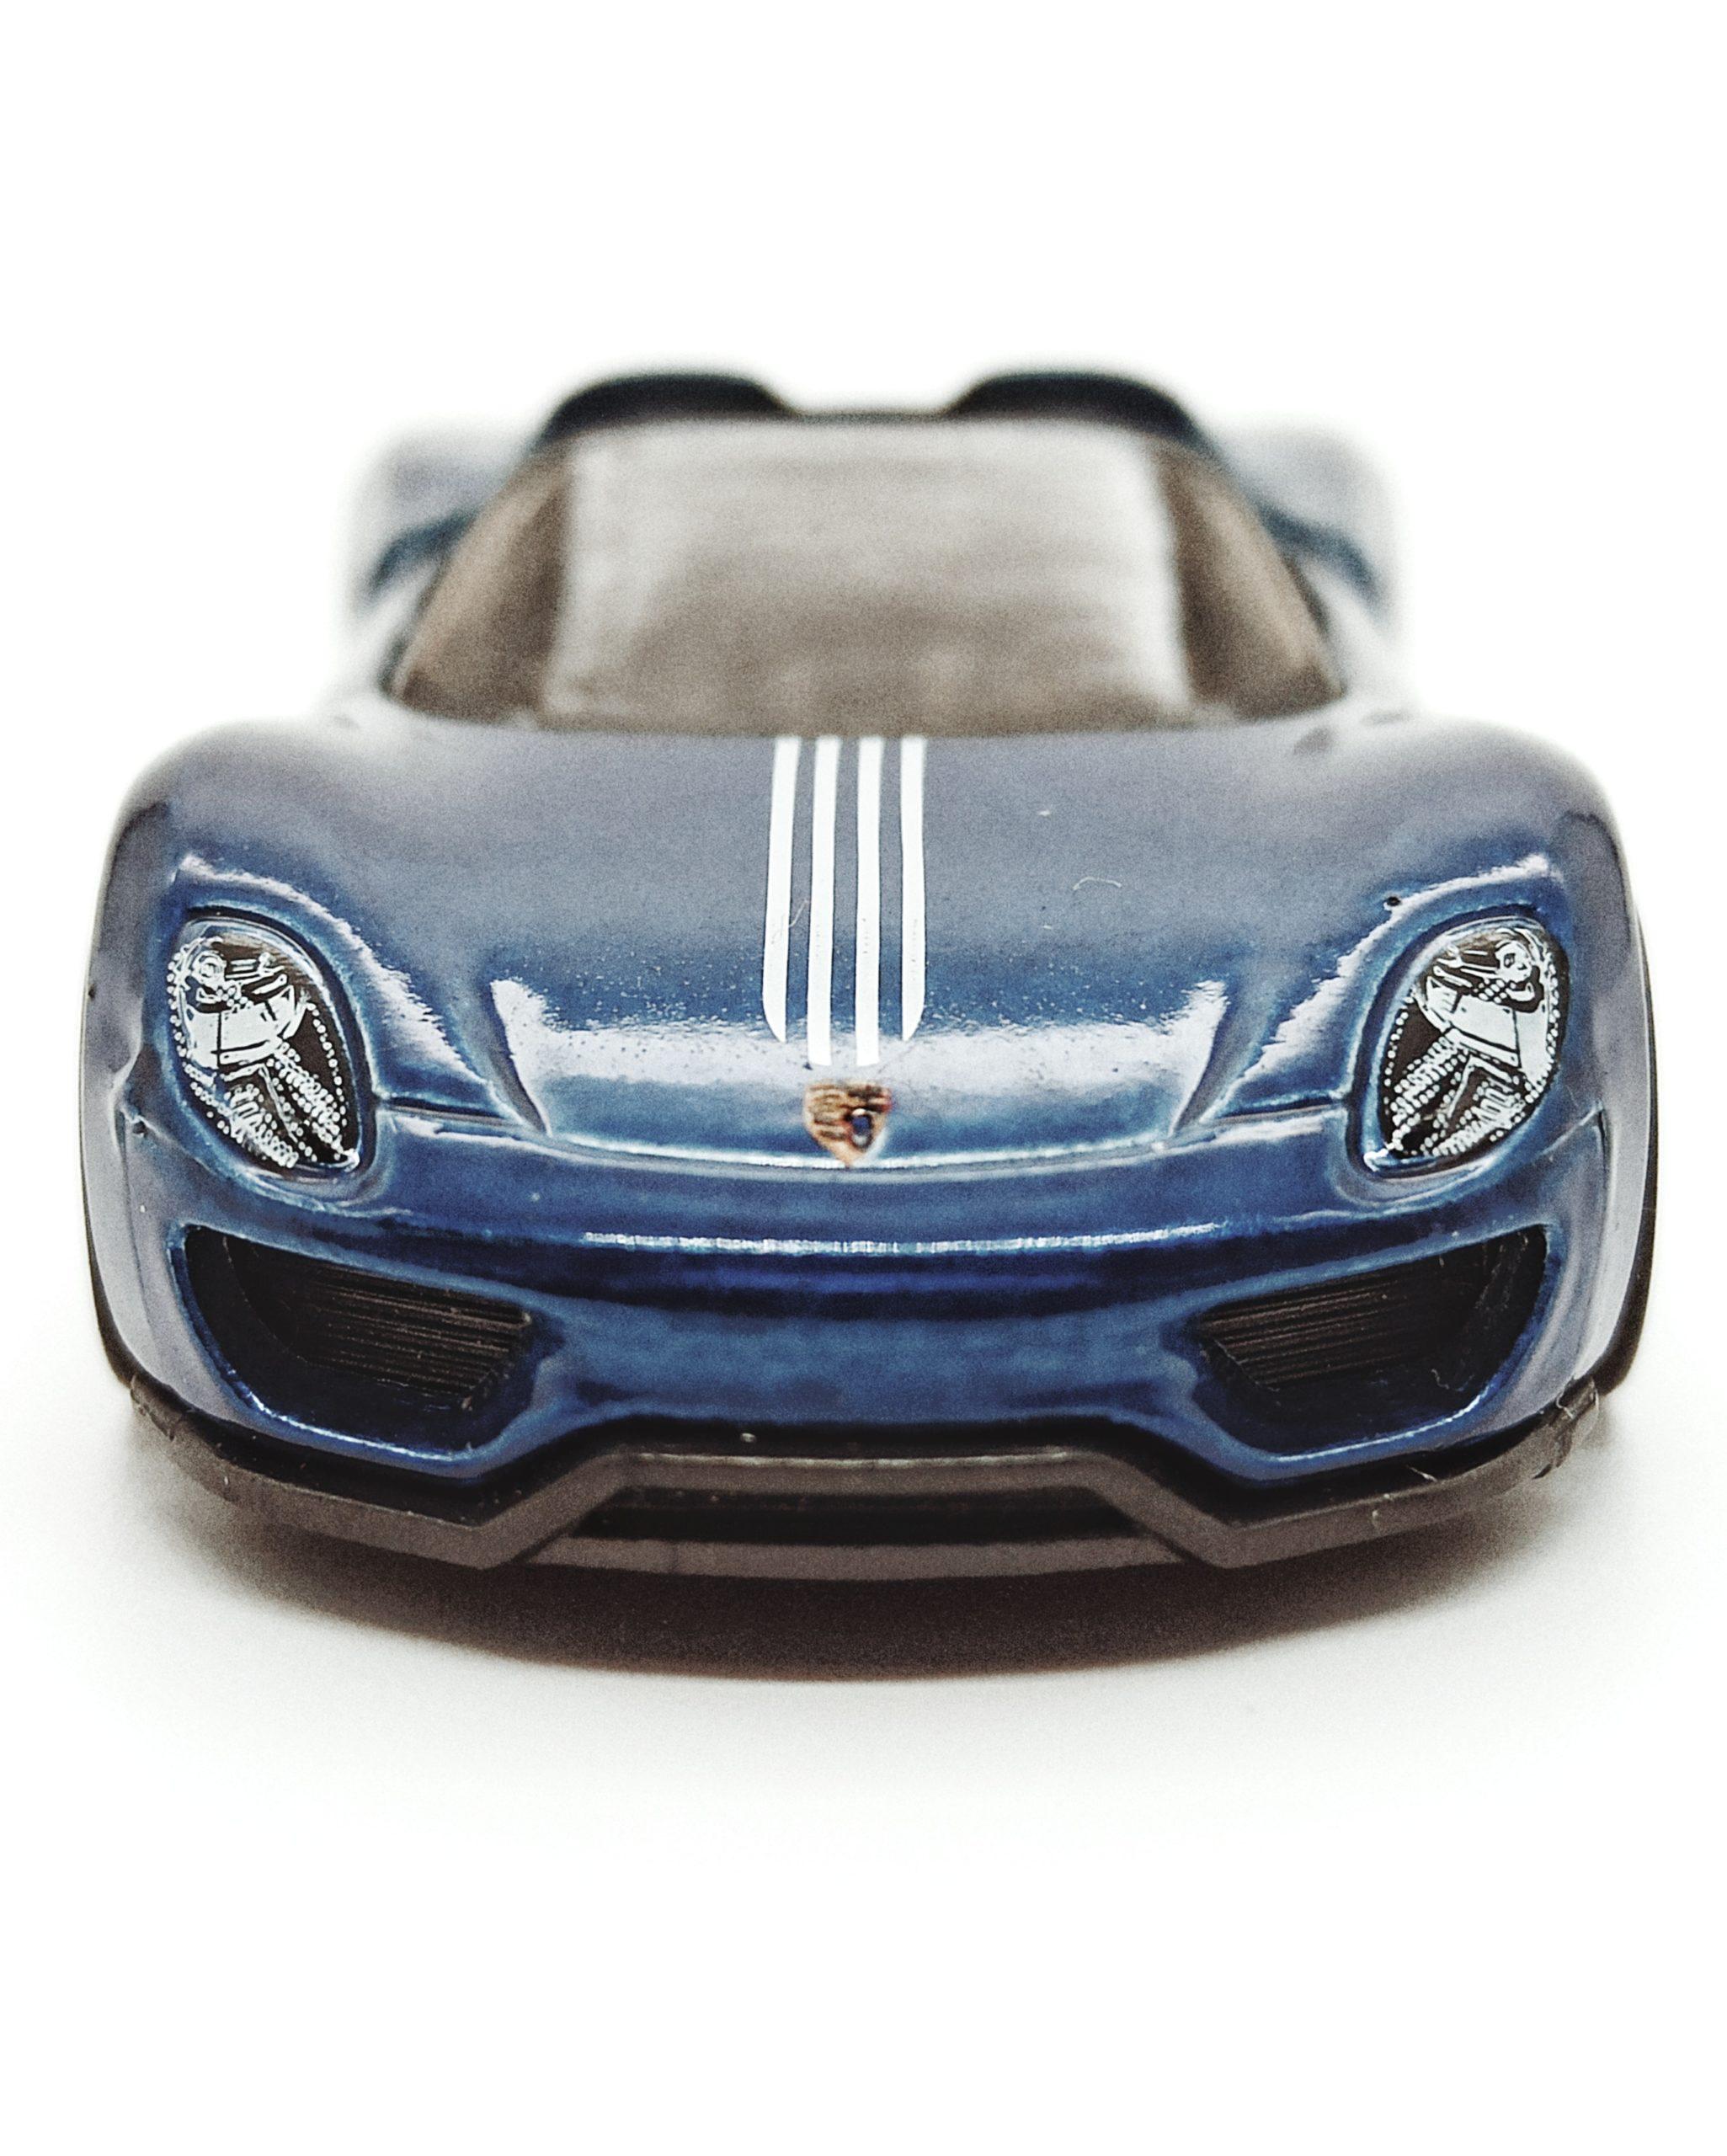 Hot Wheels Porsche 918 Spyder (2018 model) (GHG26) 2020 (94/250) Porsche (5/5) spectraflame blue Super Treasure Hunt (STH) front